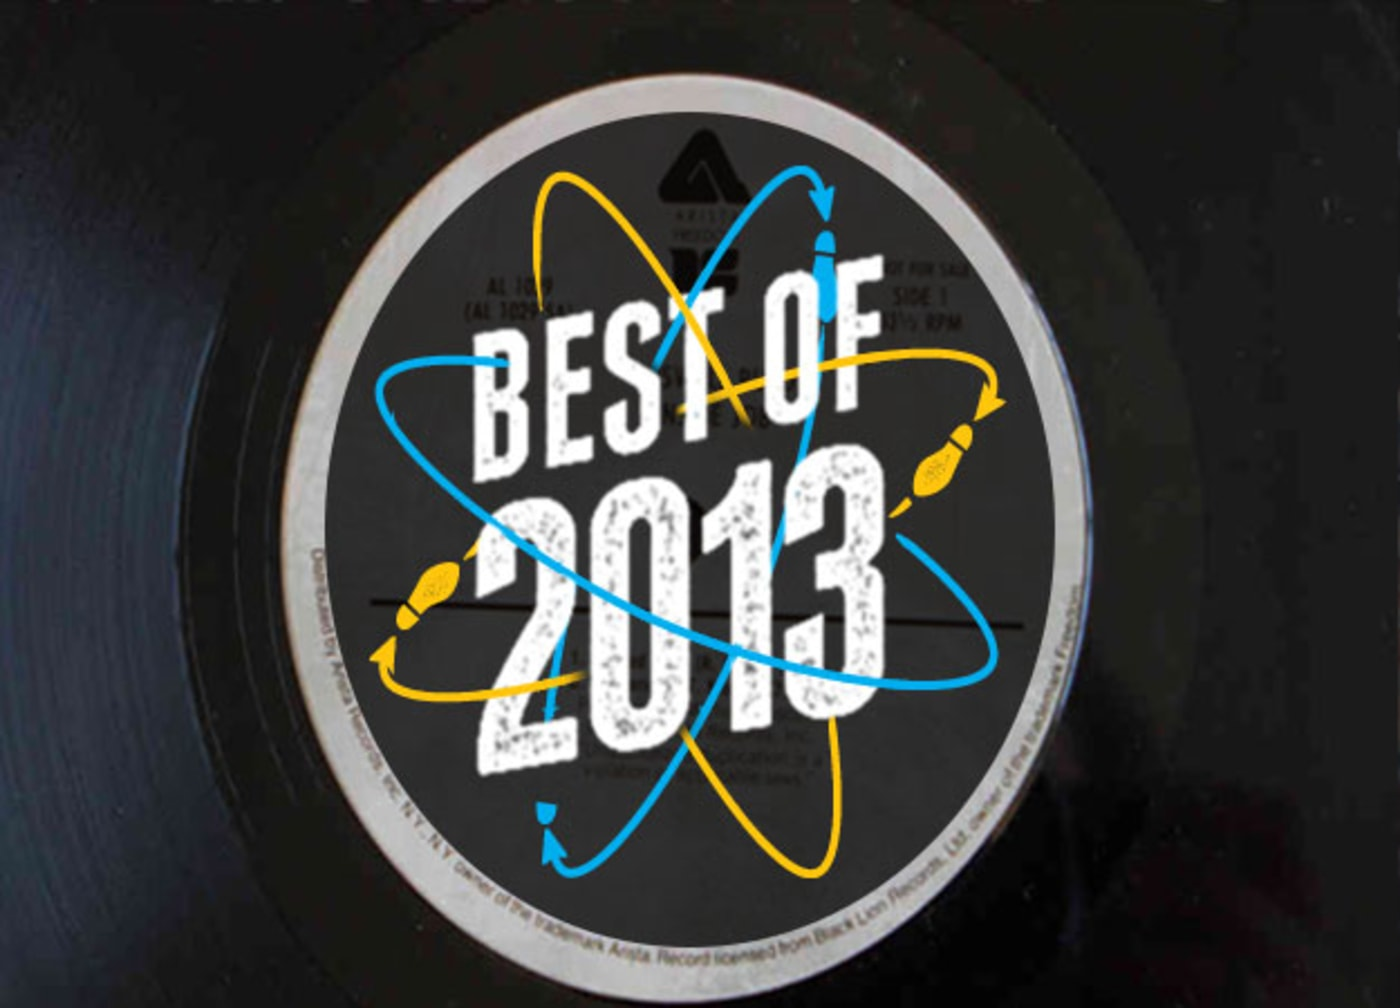 DAD best labels 2013